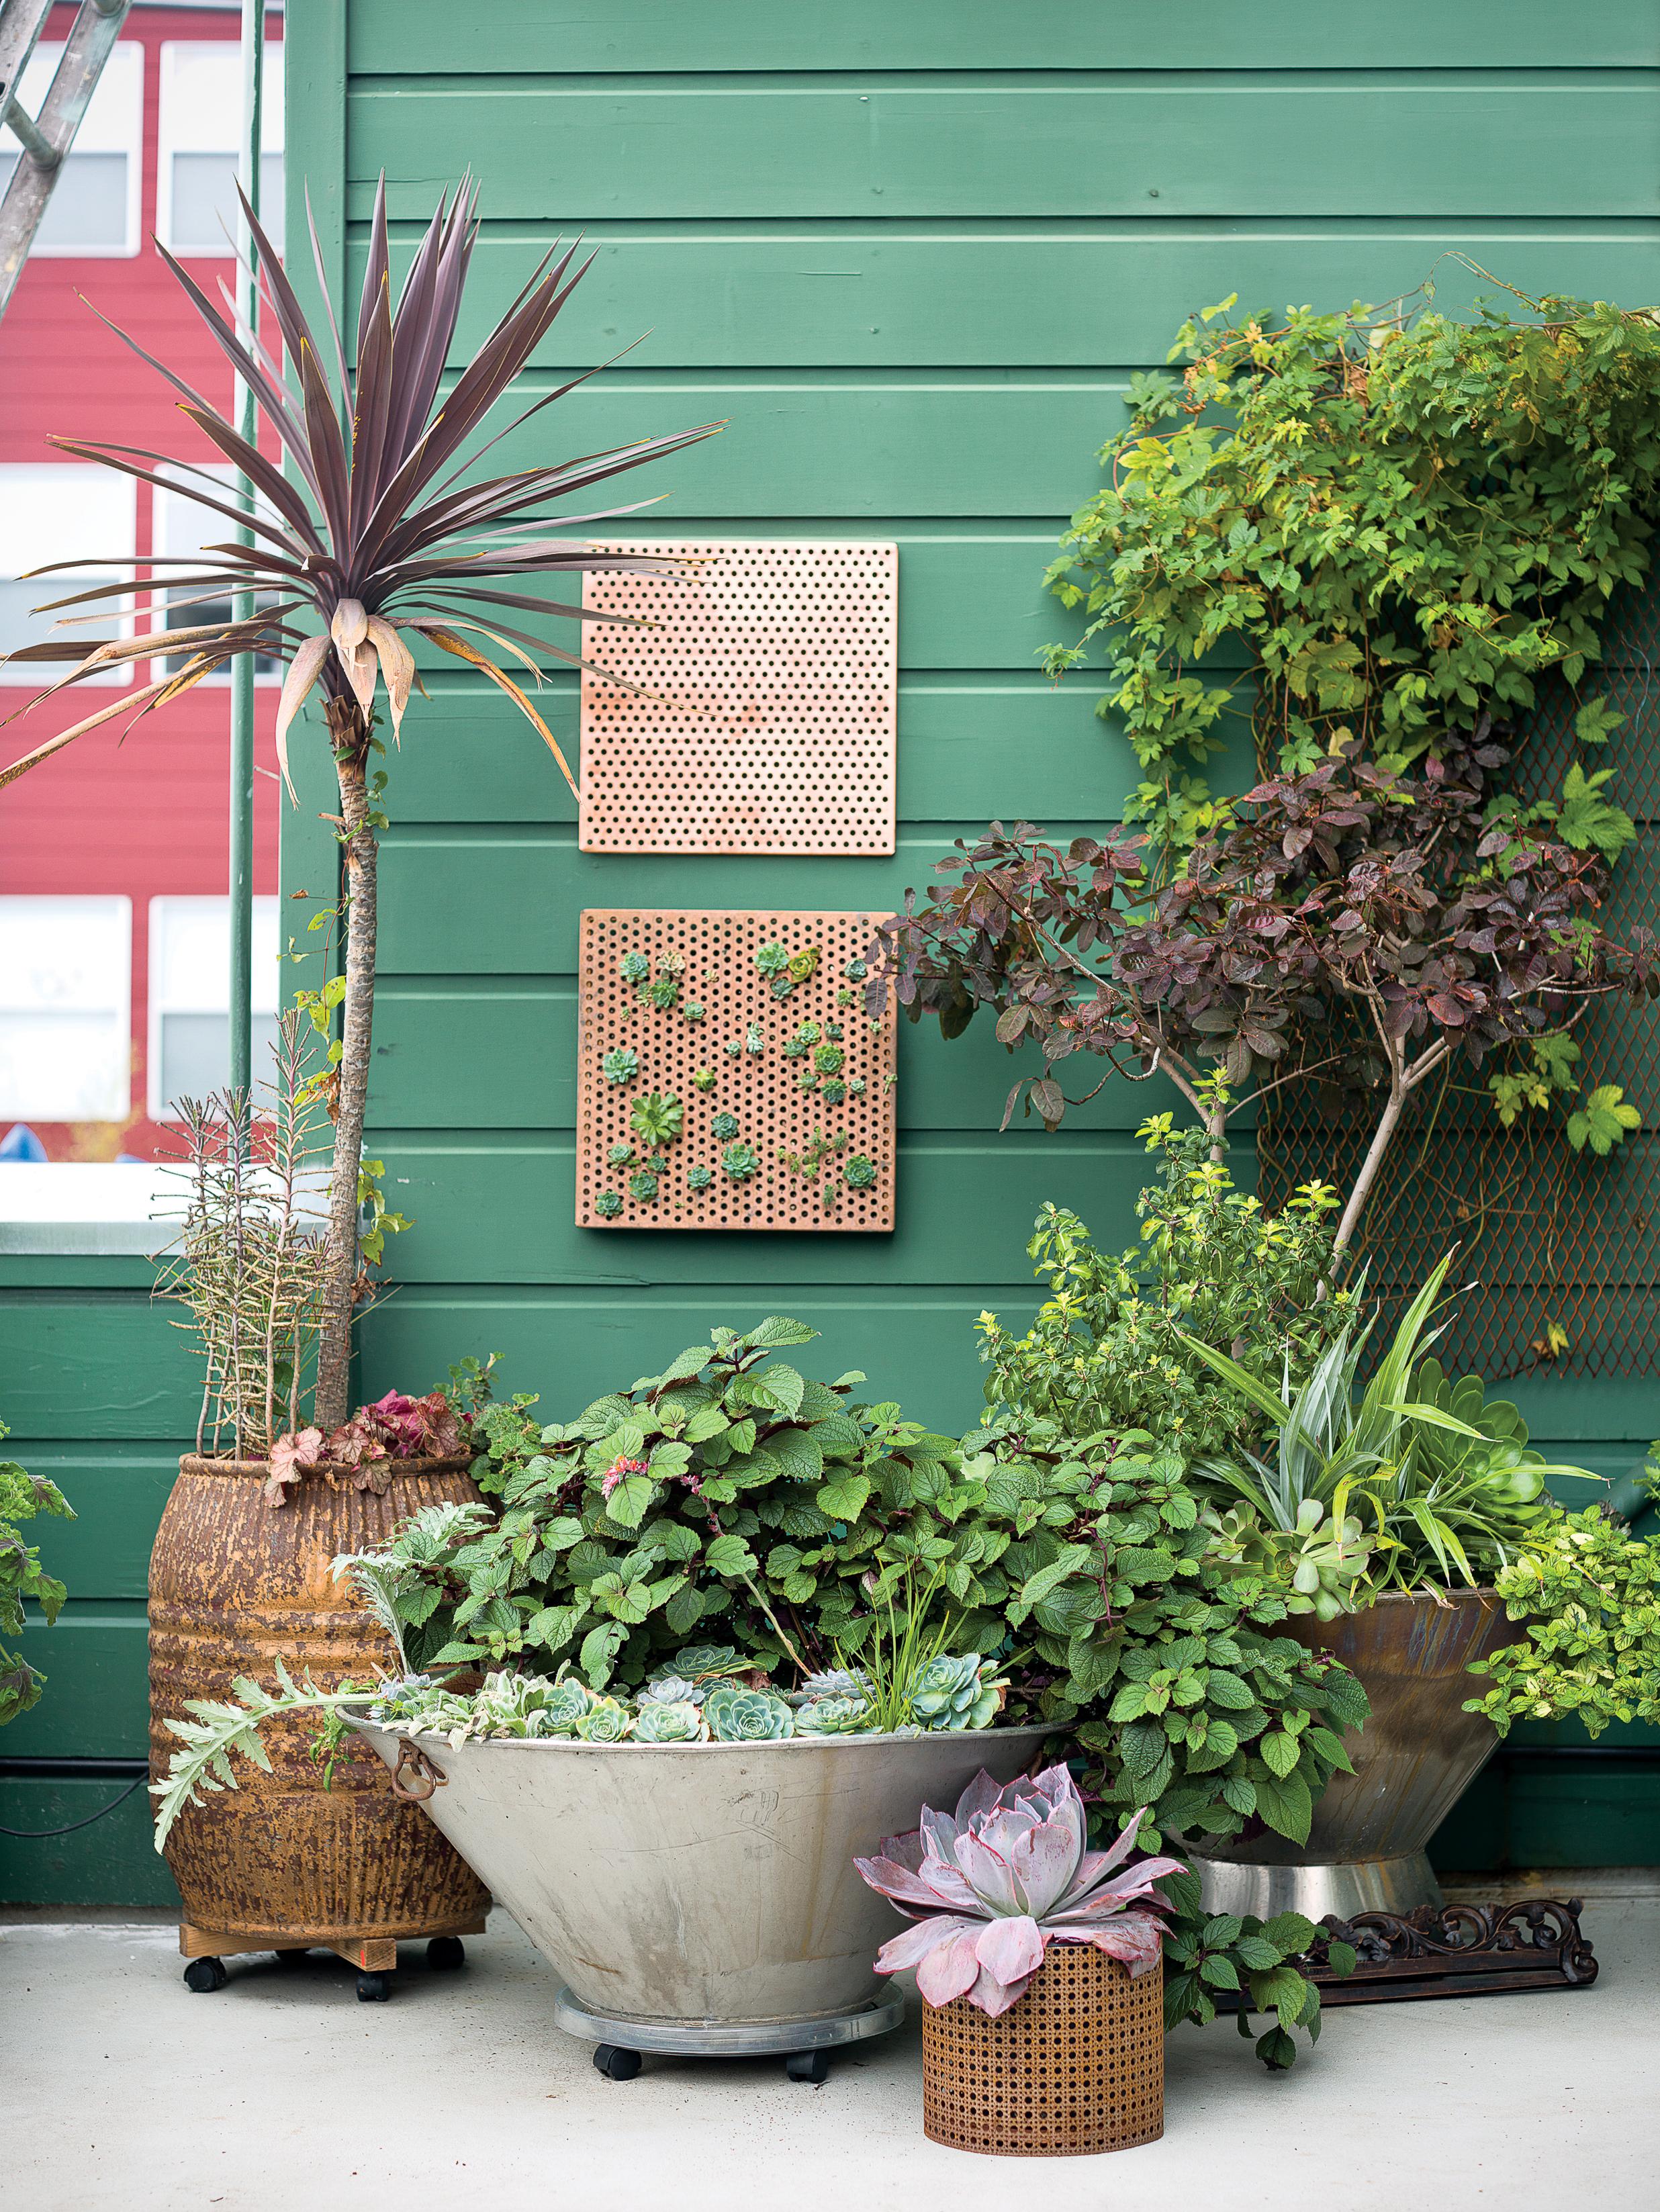 Side Yard Ideas - Sunset - Sunset Magazine on Small Side Yard Ideas id=94009